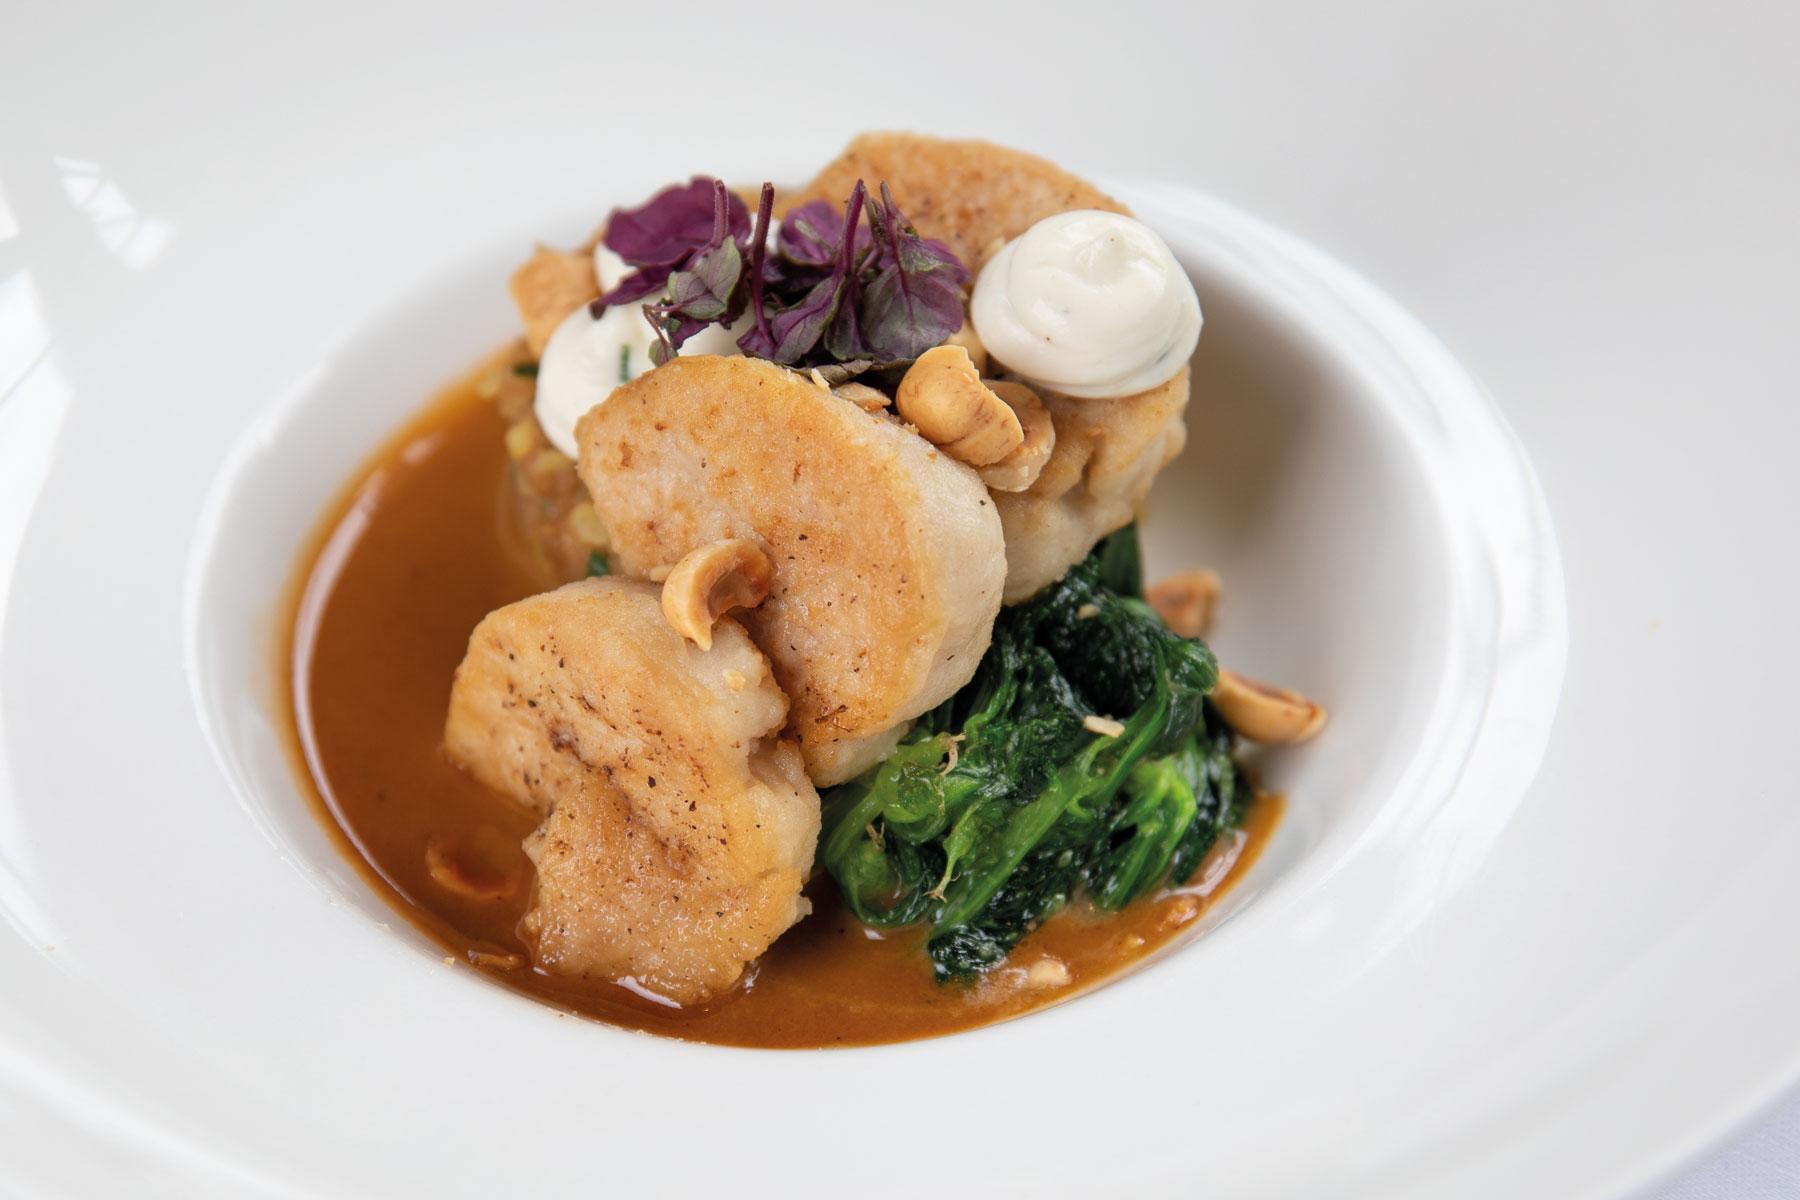 Foodphotography-stuttgart-restaurant-finch